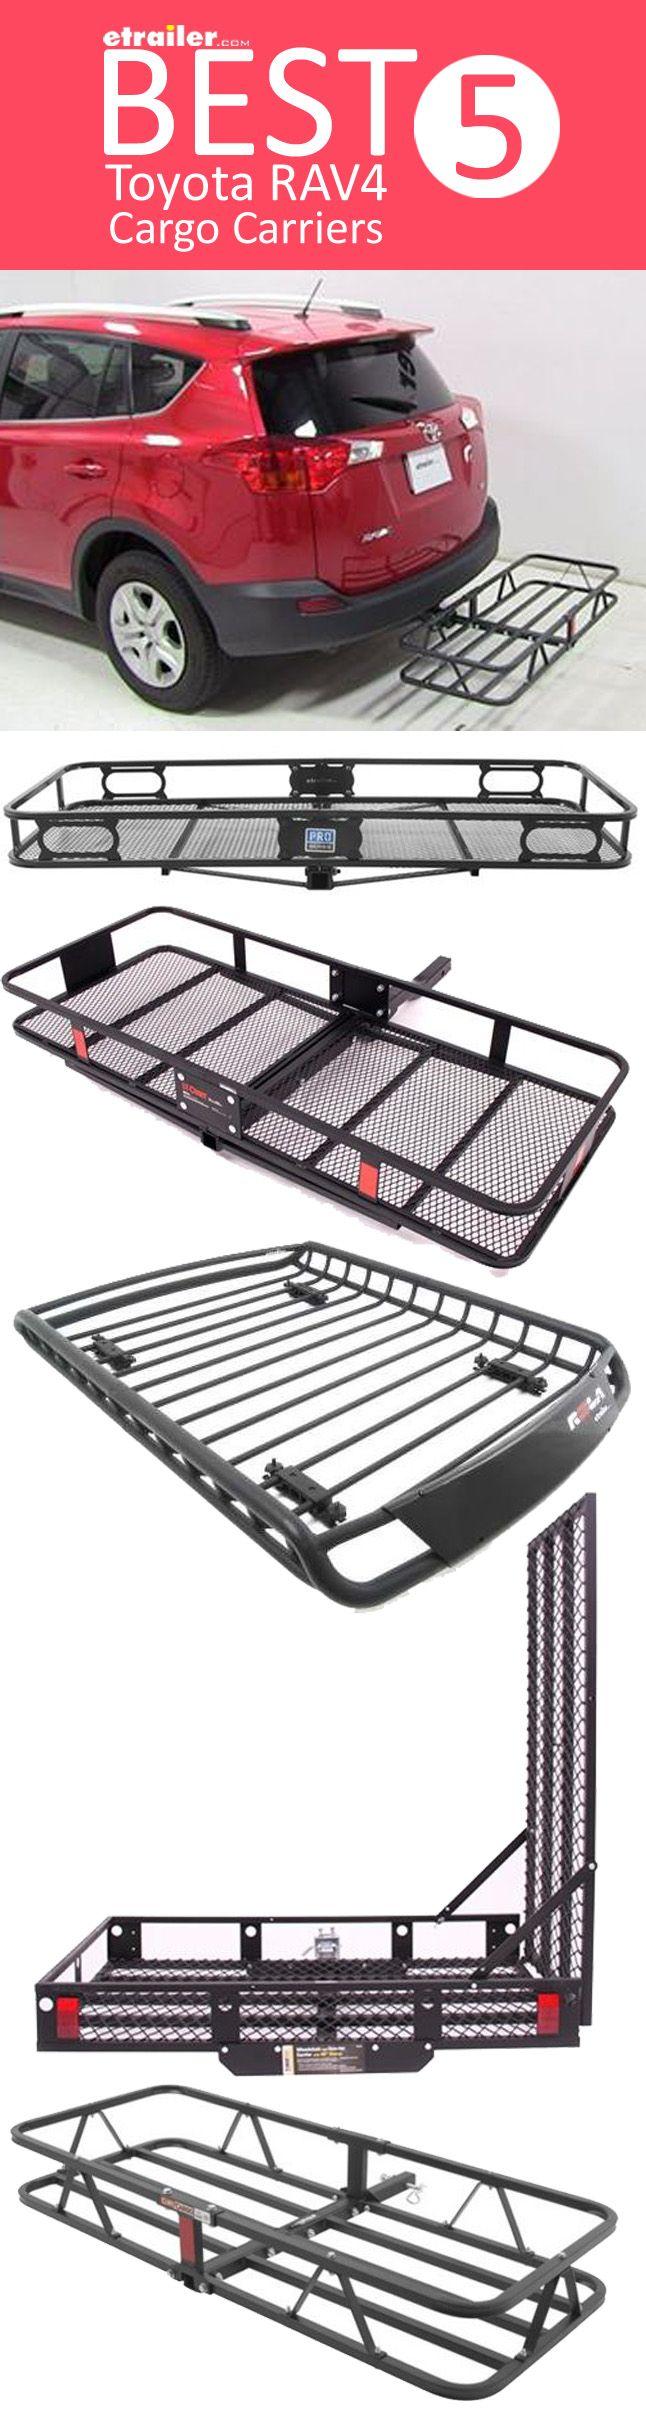 Roof Storage Box Thule Ideas For Sale Rack Rental Vw Tiguan Container Van Subaru Car Cargo Suv Diy Rmft440 Masterfit Bo440l Black Rhino Yakima Skybox 21 Keen Outdoor Gear Expocafeperu Com